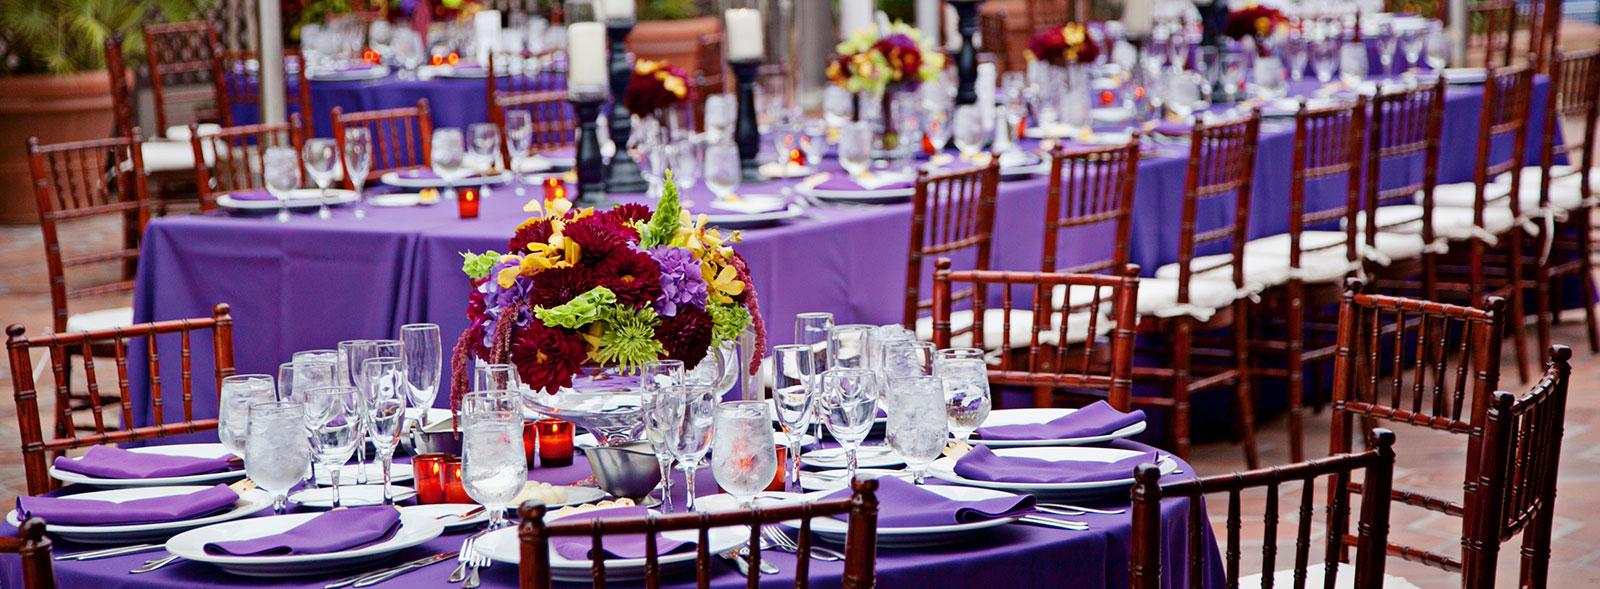 Catering at La Jolla Shores Hotel, California